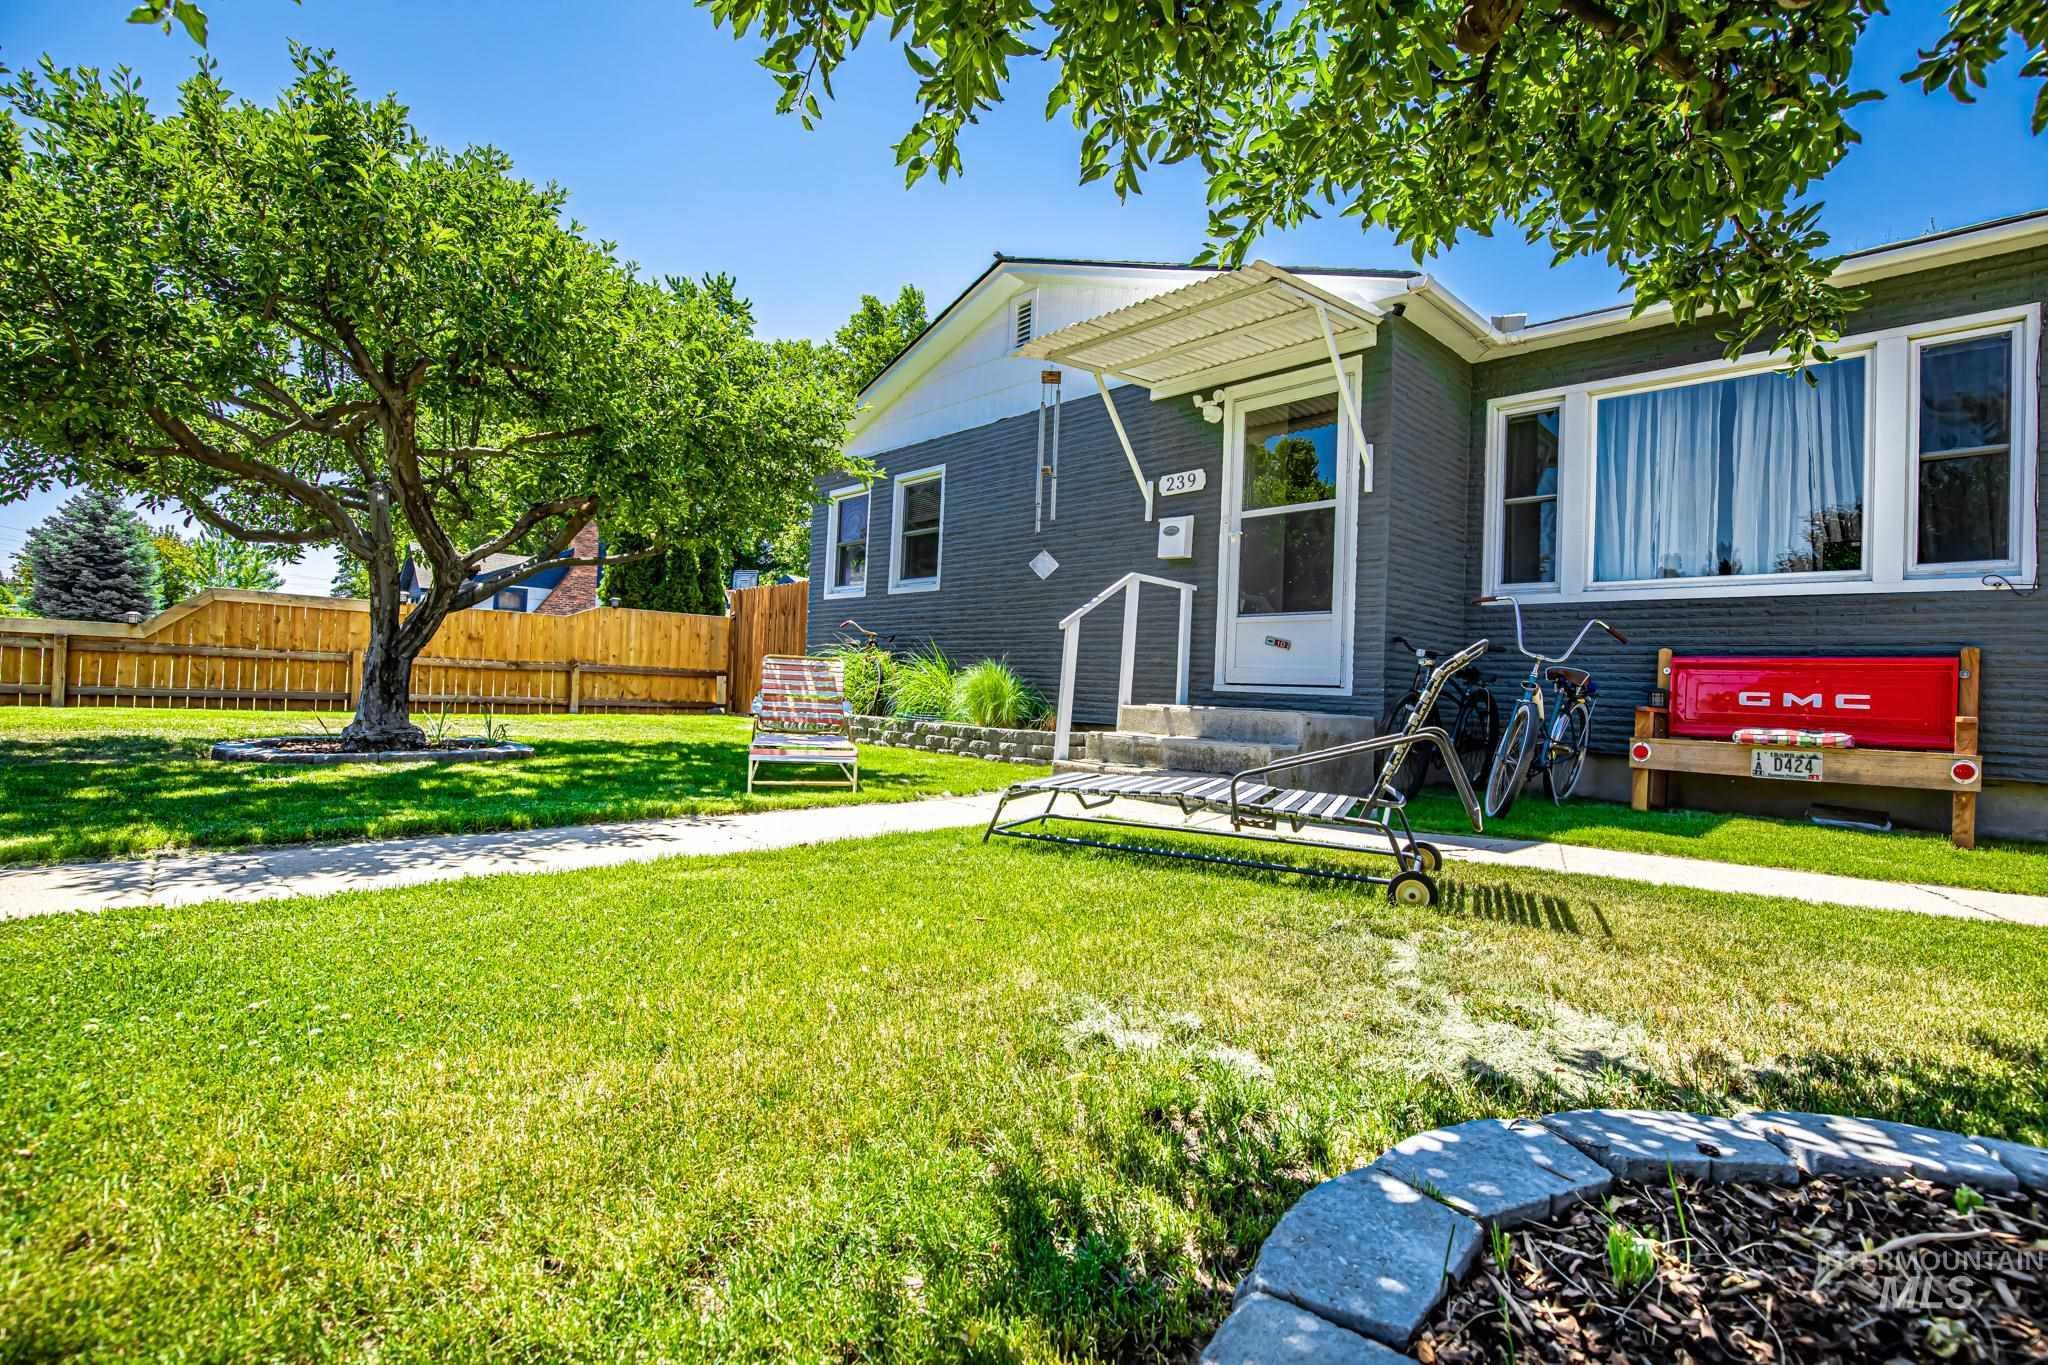 239 W Boise Ave Property Photo 1